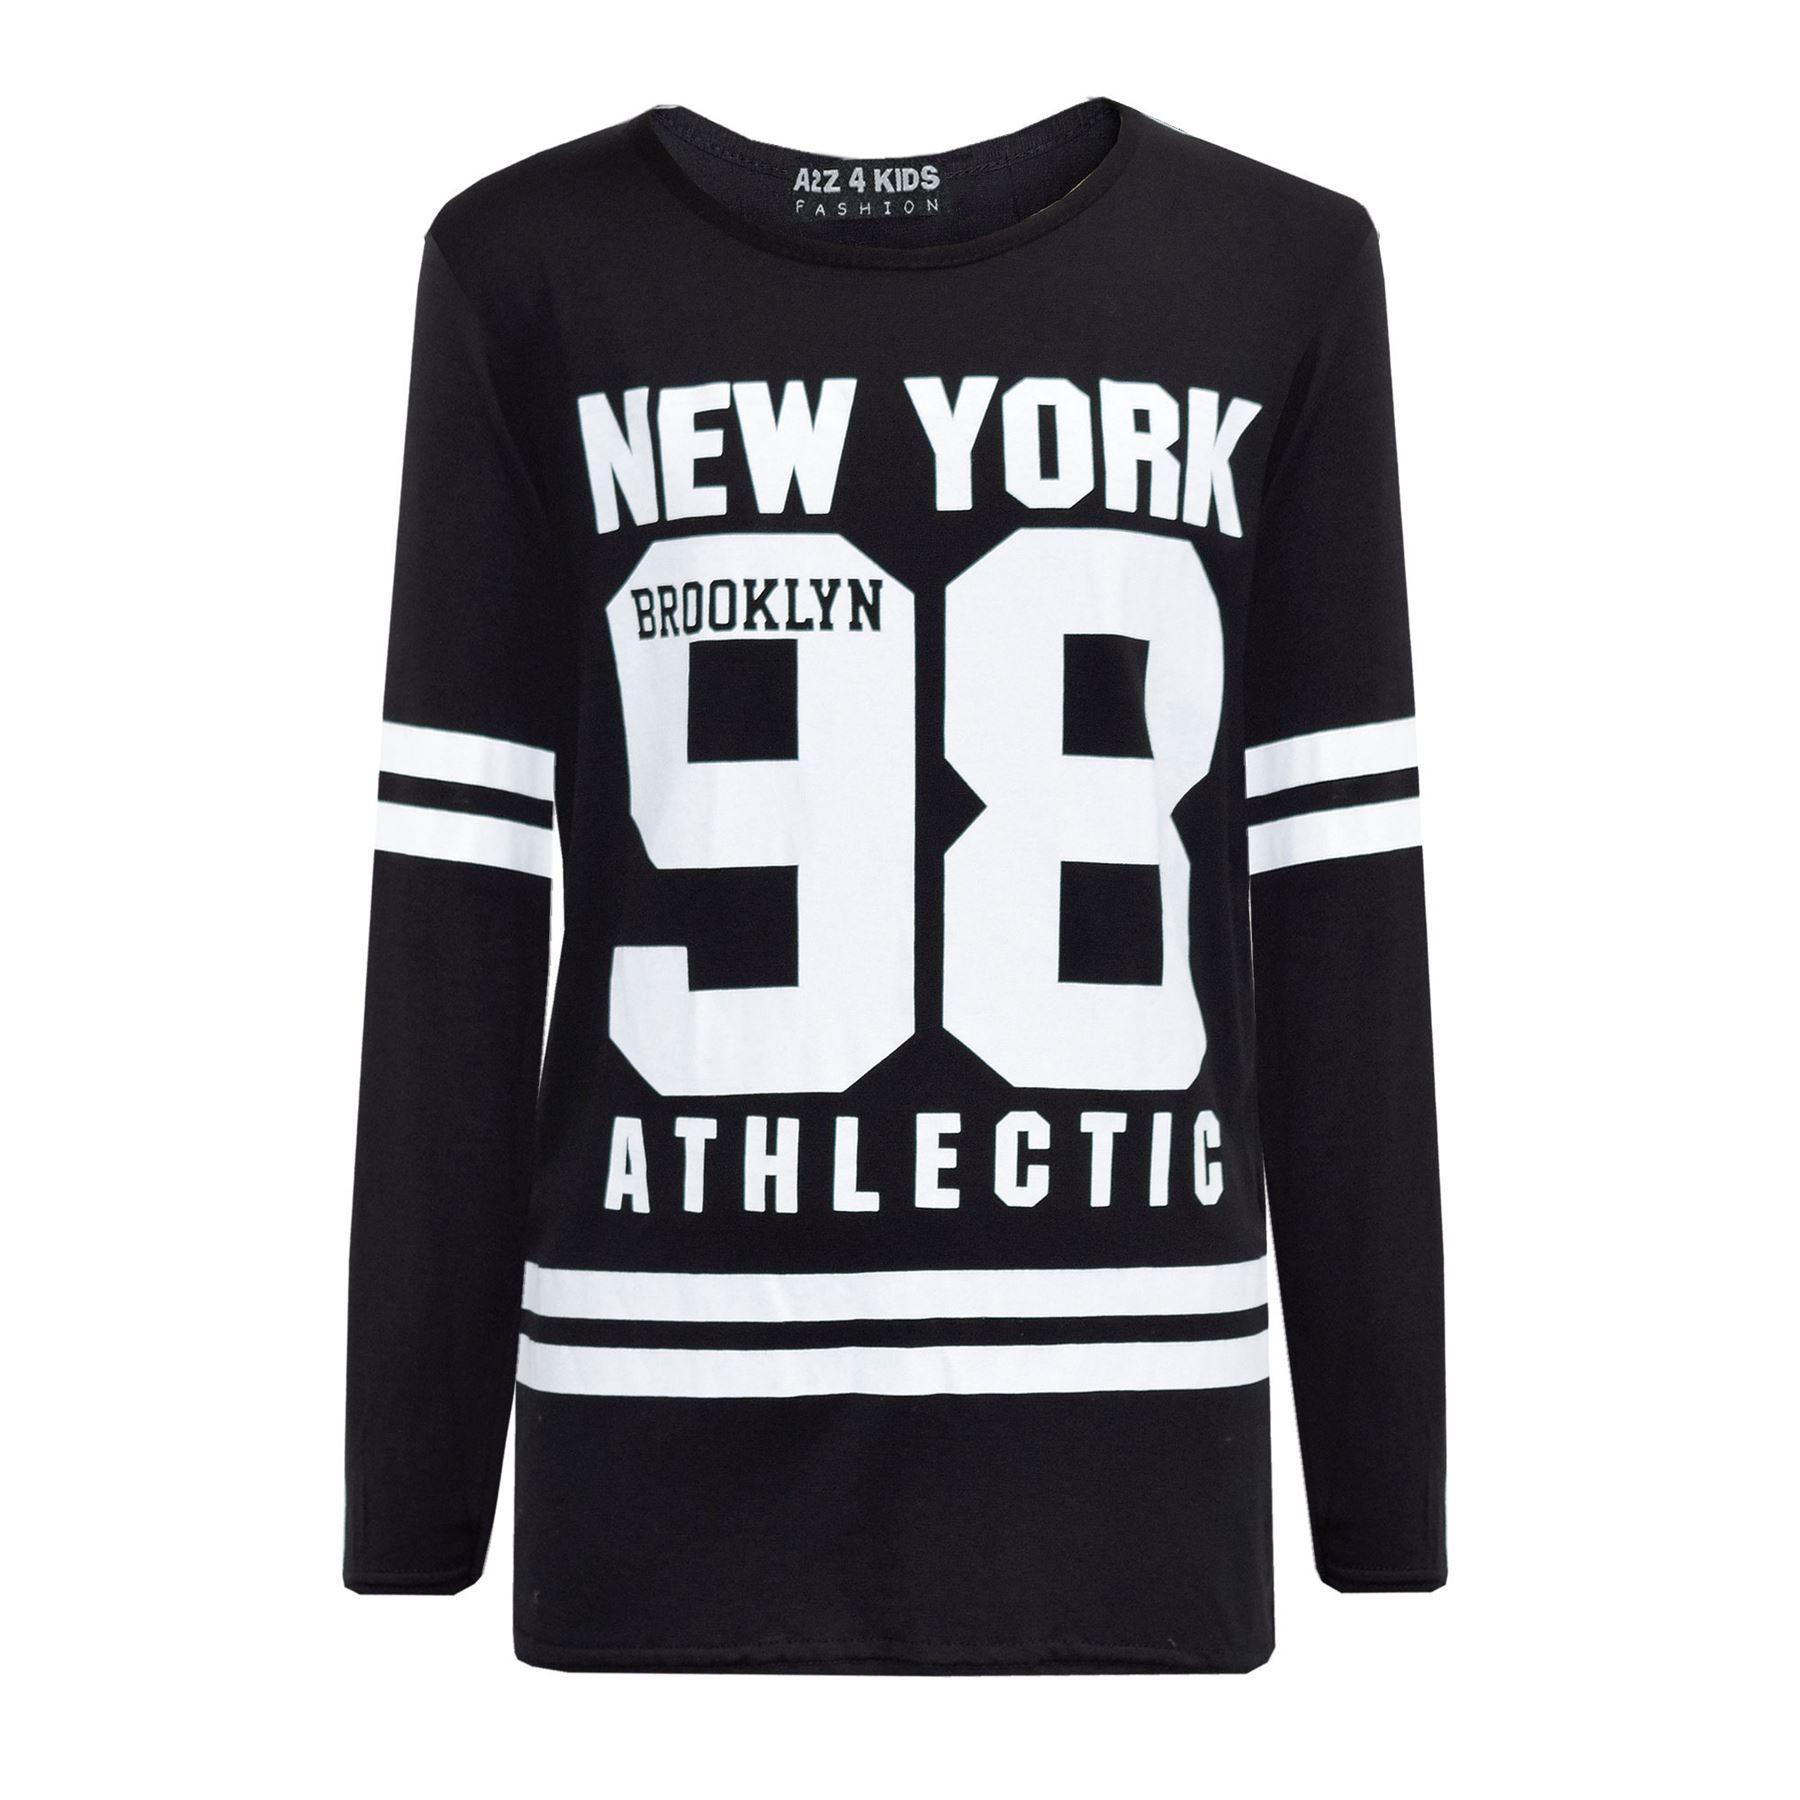 Girls-NEW-YORK-BROOKLYN-98-ATHLECTIC-Camouflage-Print-Top-amp-Legging-Set-7-13-Yr thumbnail 53